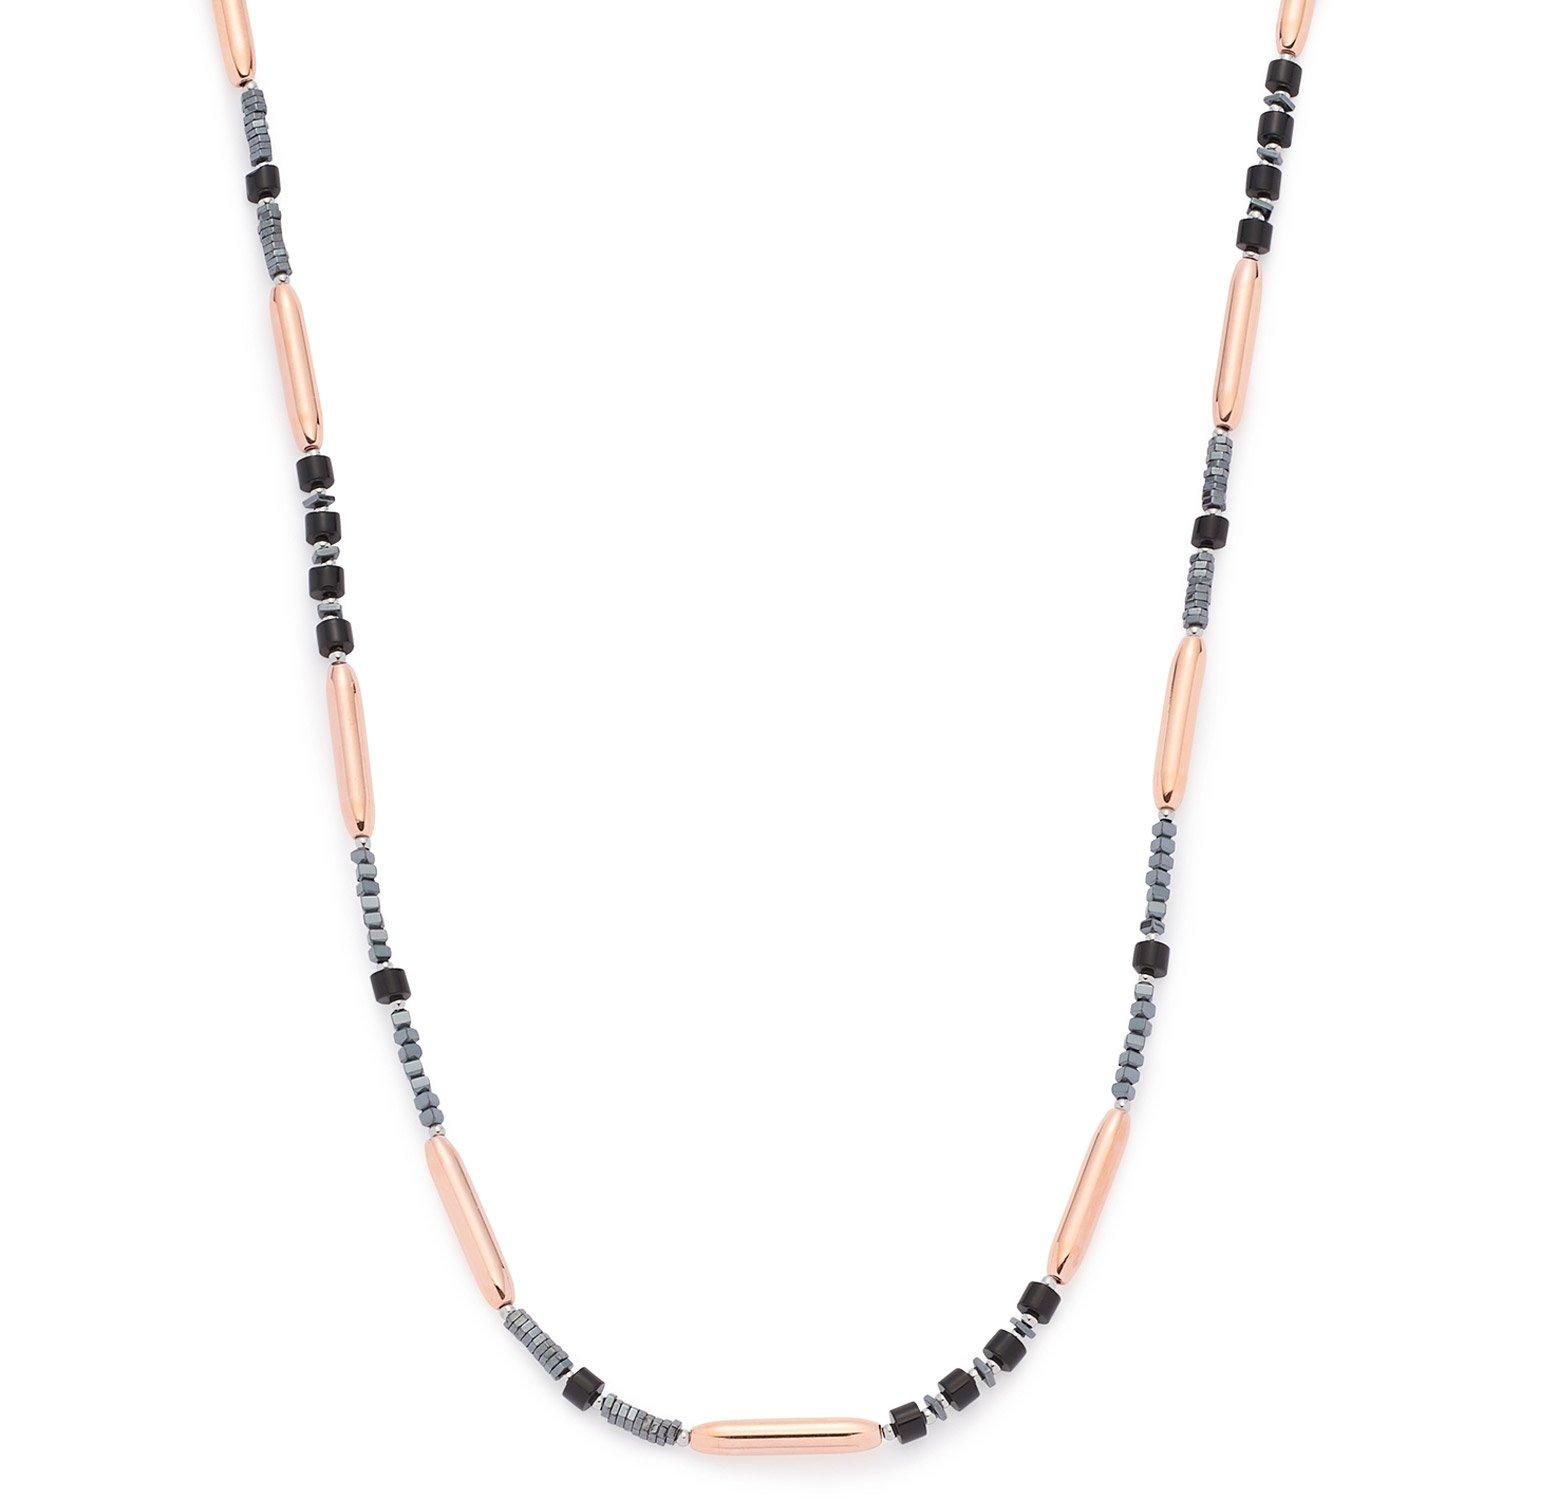 bei Uhrcenter: Leonardo 016637 Damen-Halskette Mantua - Schmuck